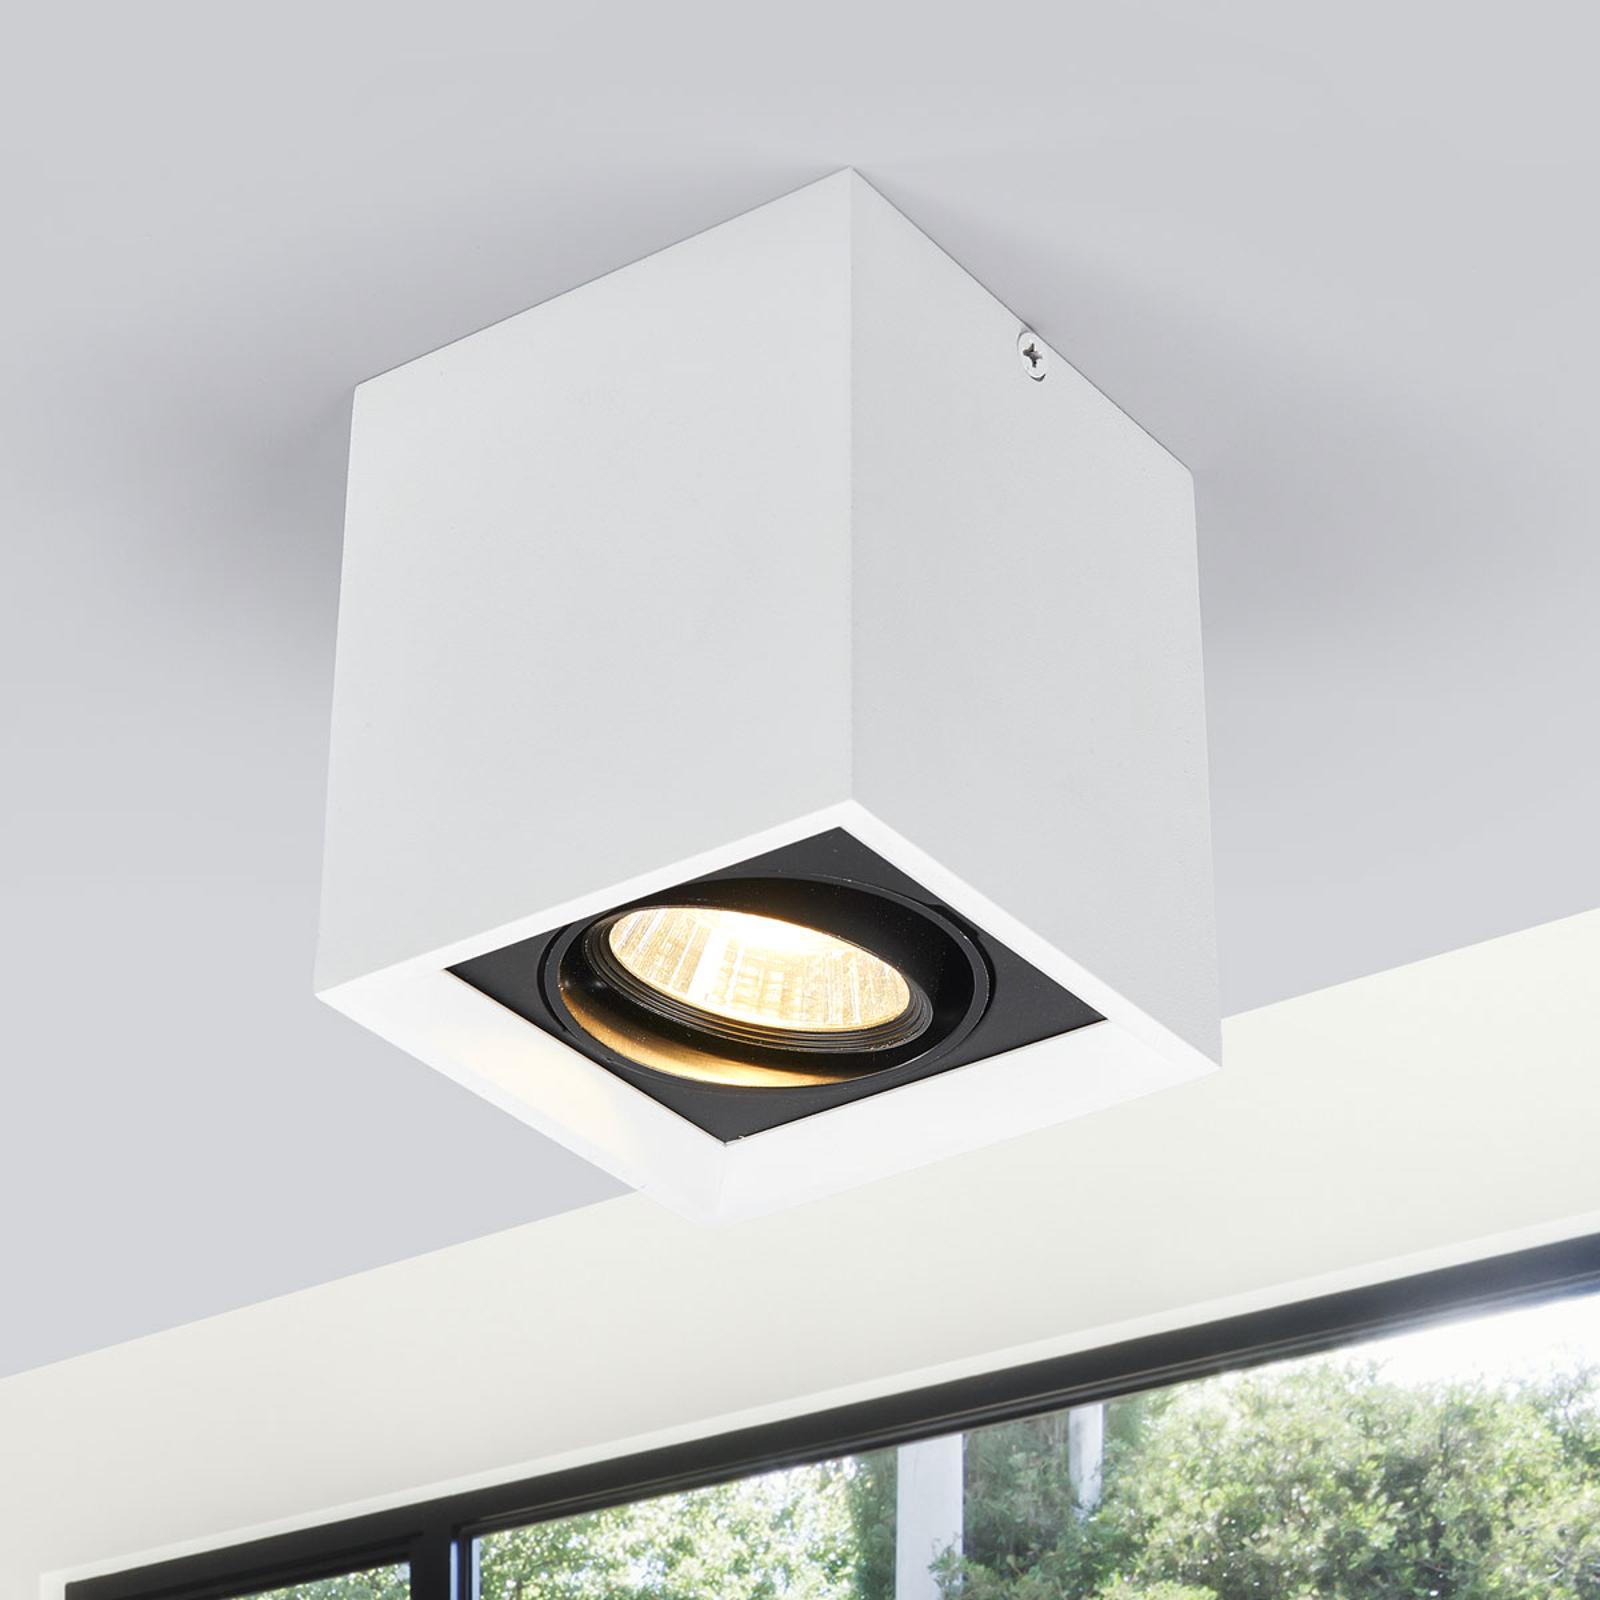 Biała oprawa LED typu downlight Loreen